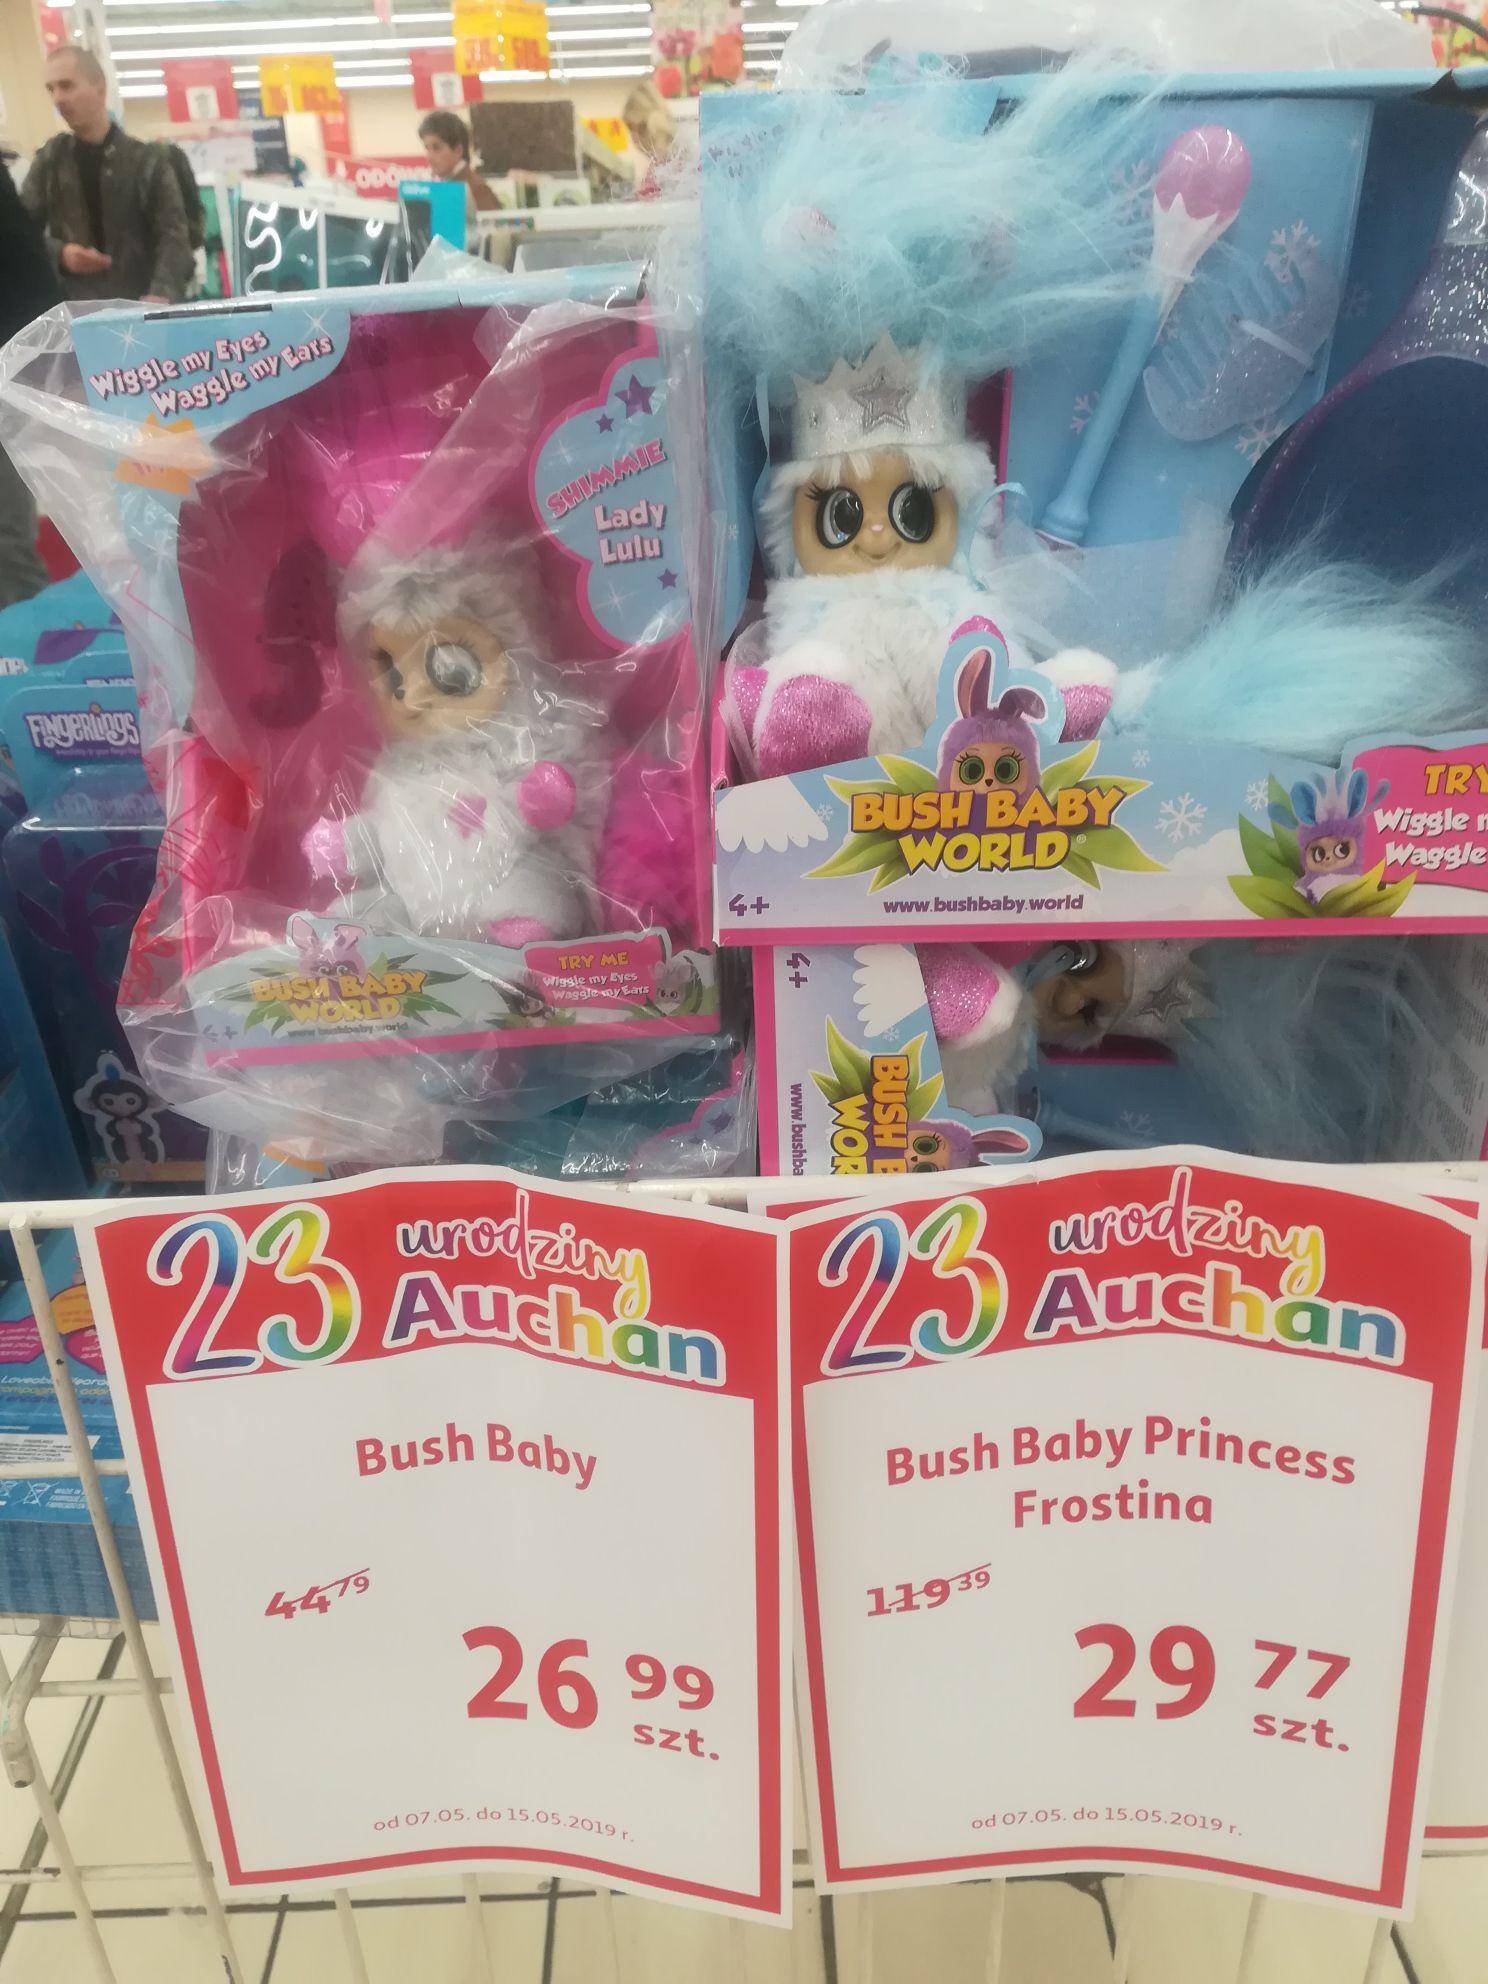 Bush Baby Princess Frostina w Auchan Bonarka